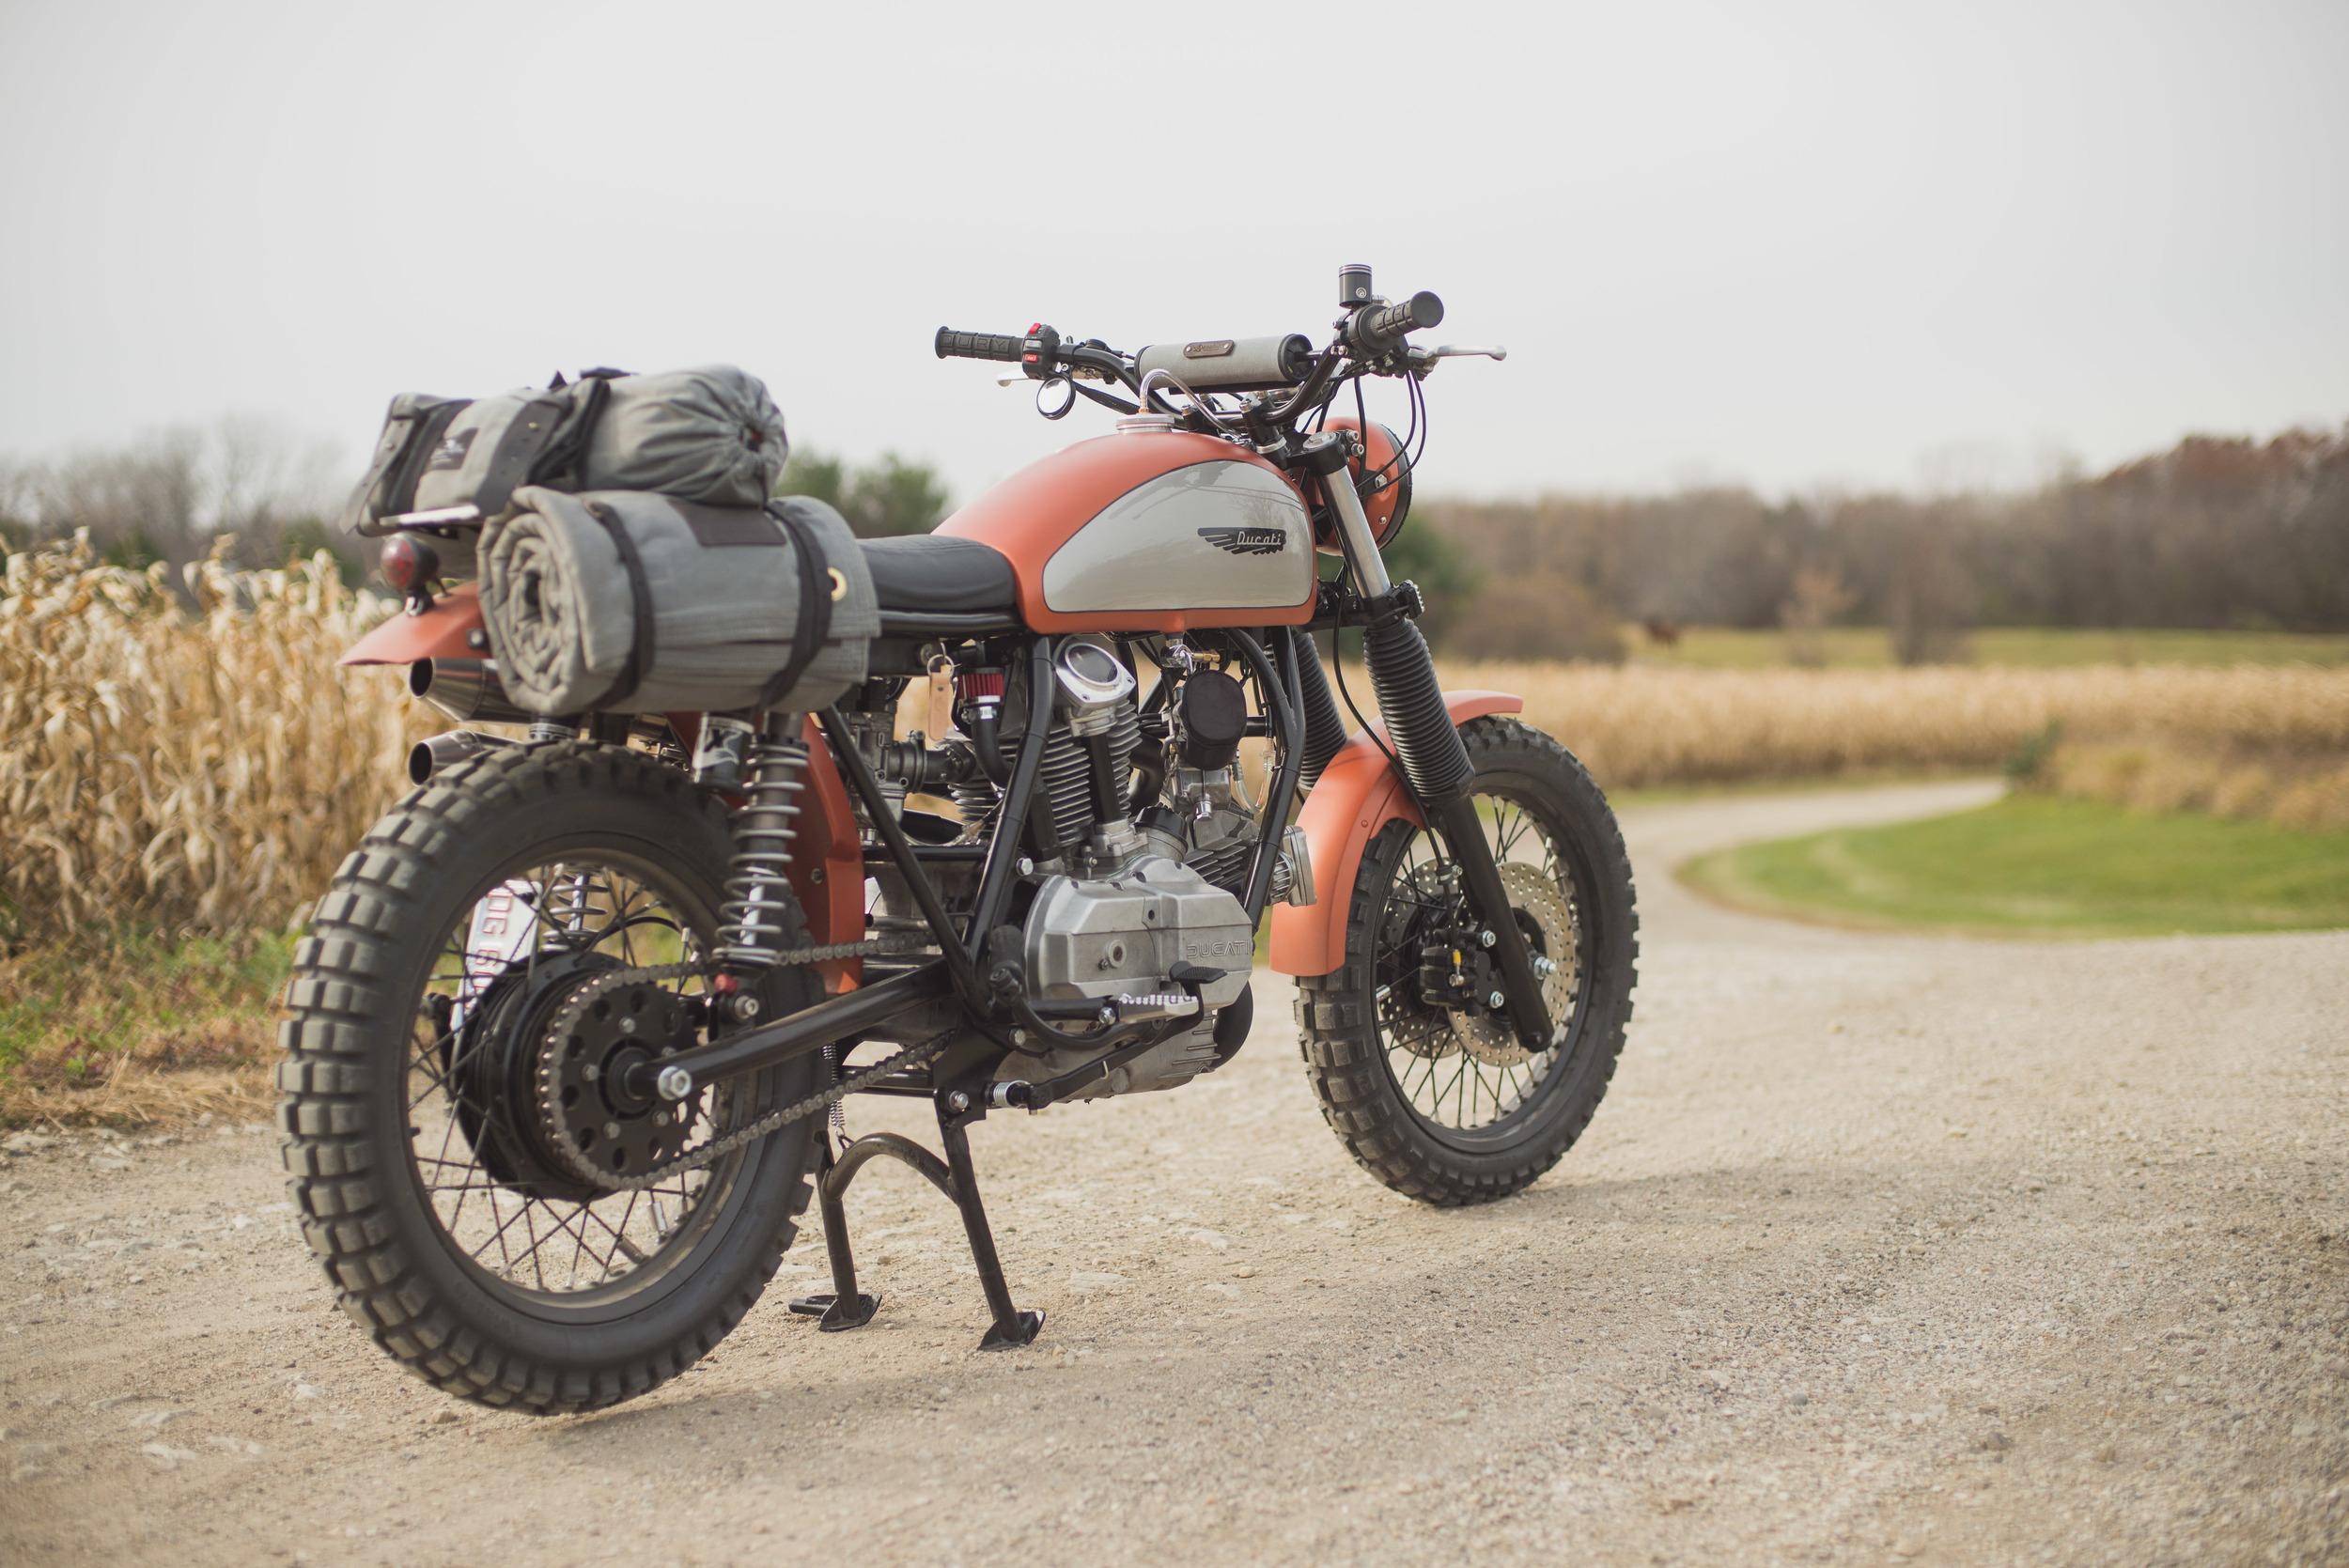 Custom Cotter Pin Gear For Analog Motorcycles Ducati Scrambler